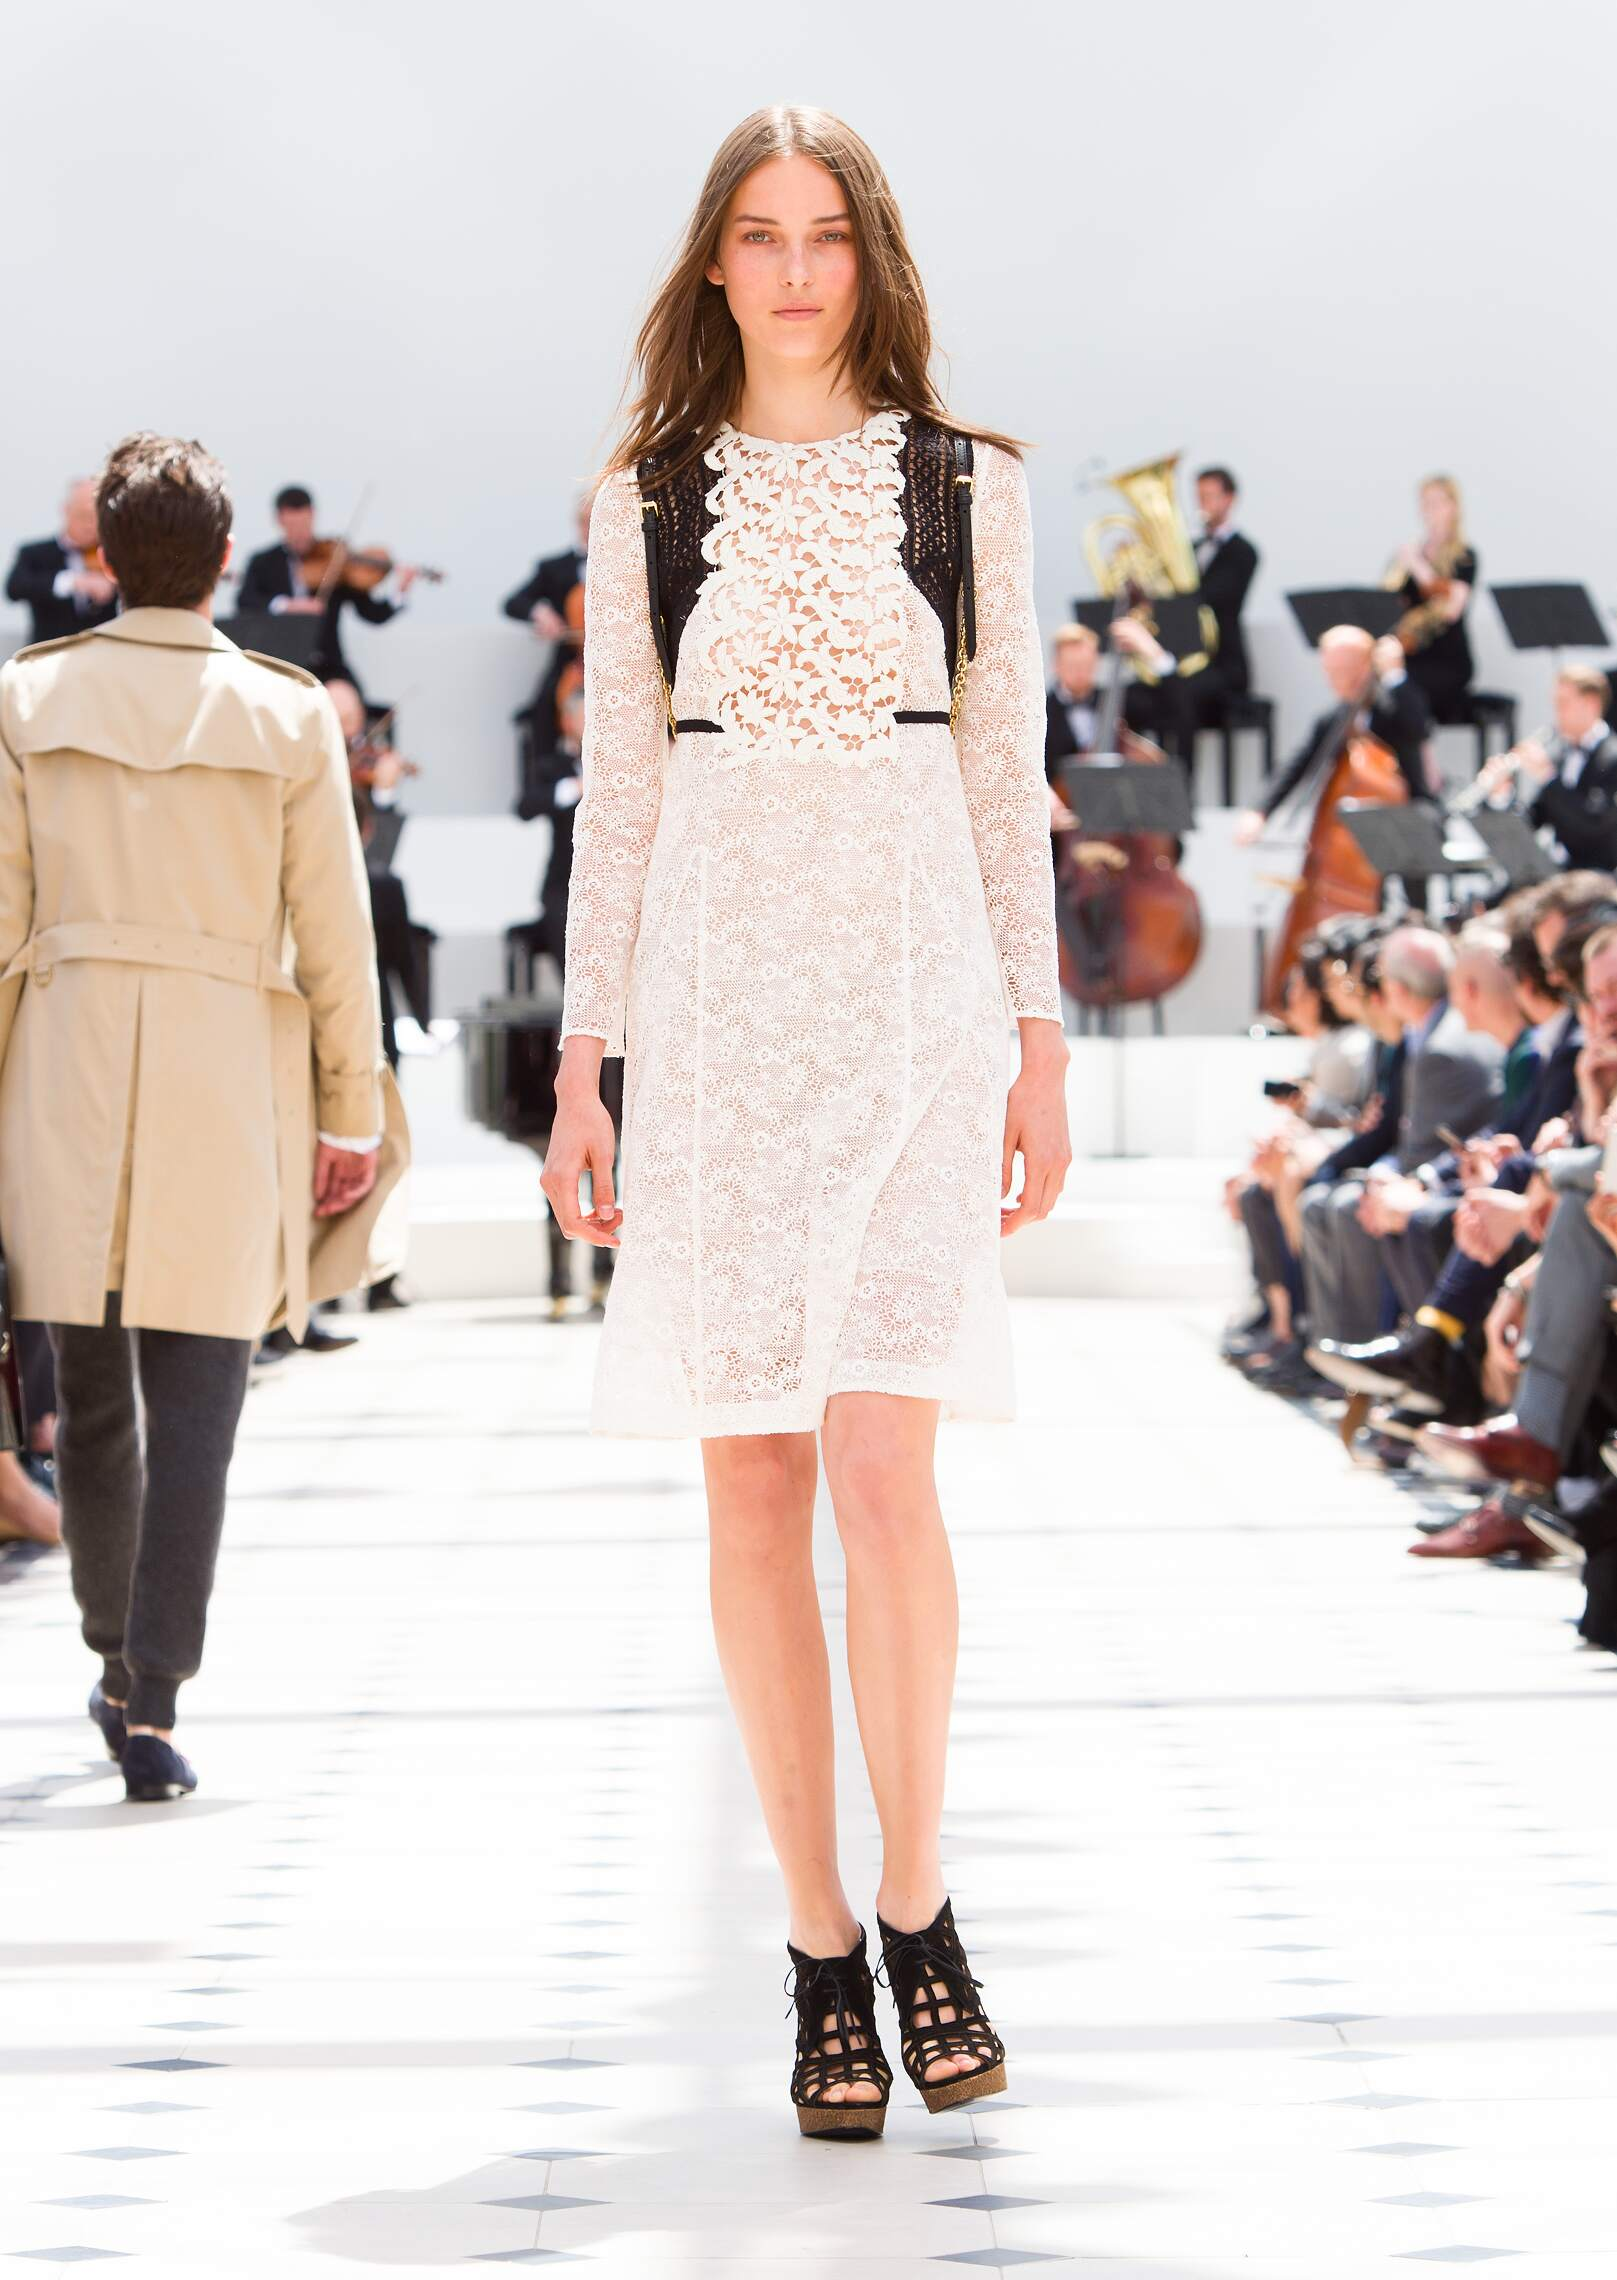 2016 Spring Fashion Woman Burberry Prorsum Collection